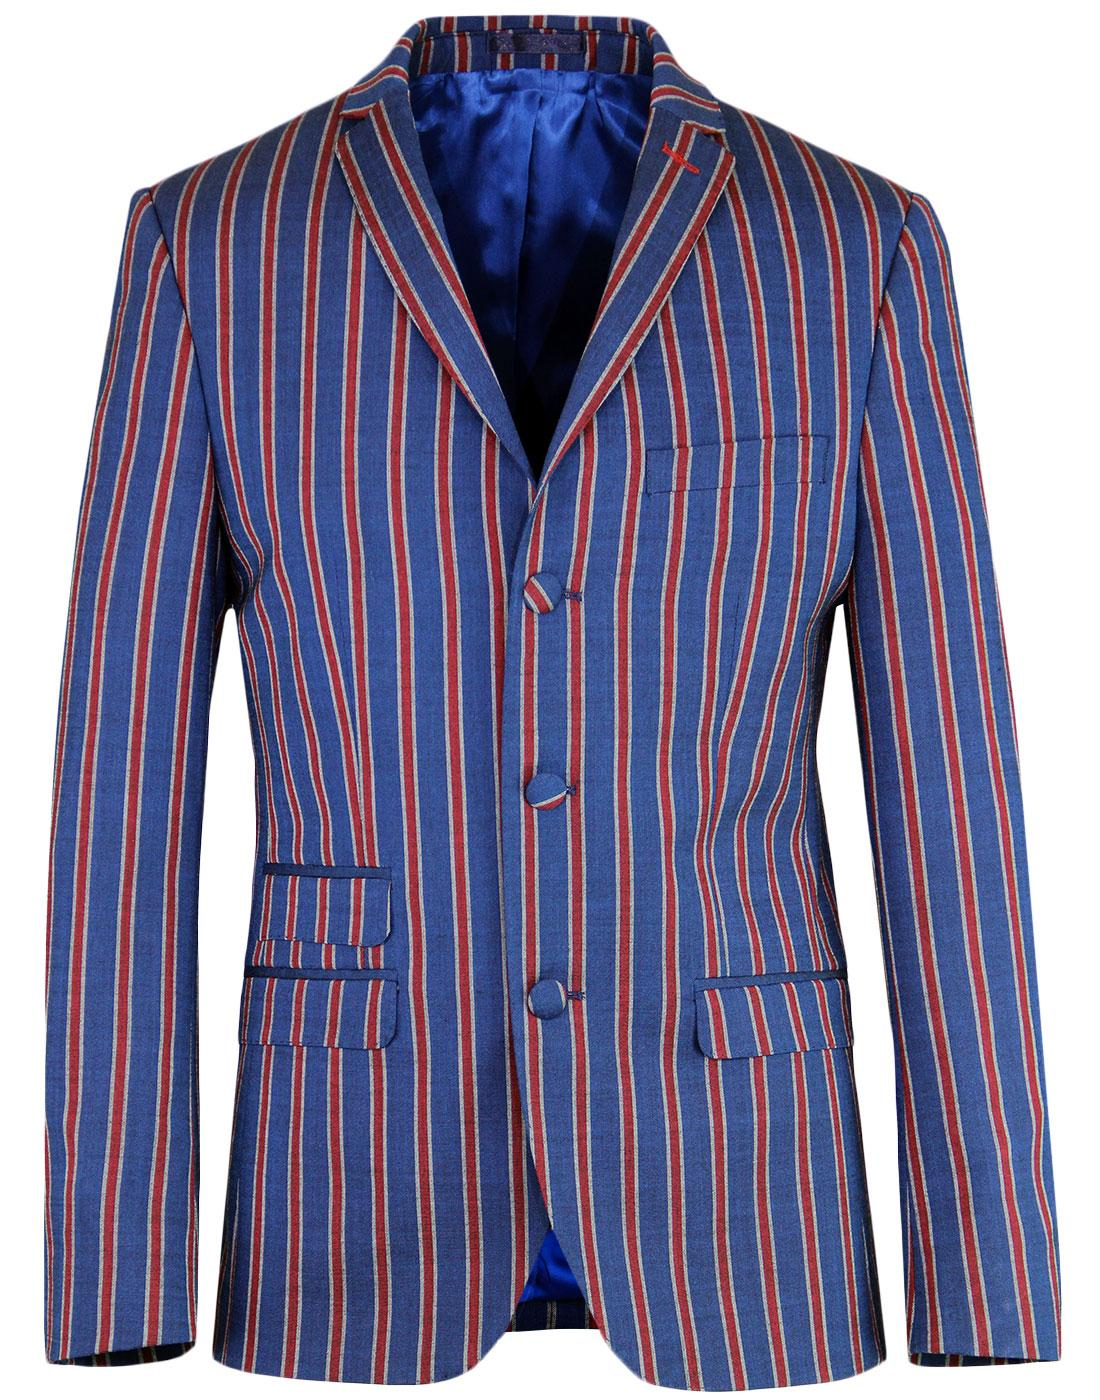 madcap england regatta stripe 3 button suit jacket